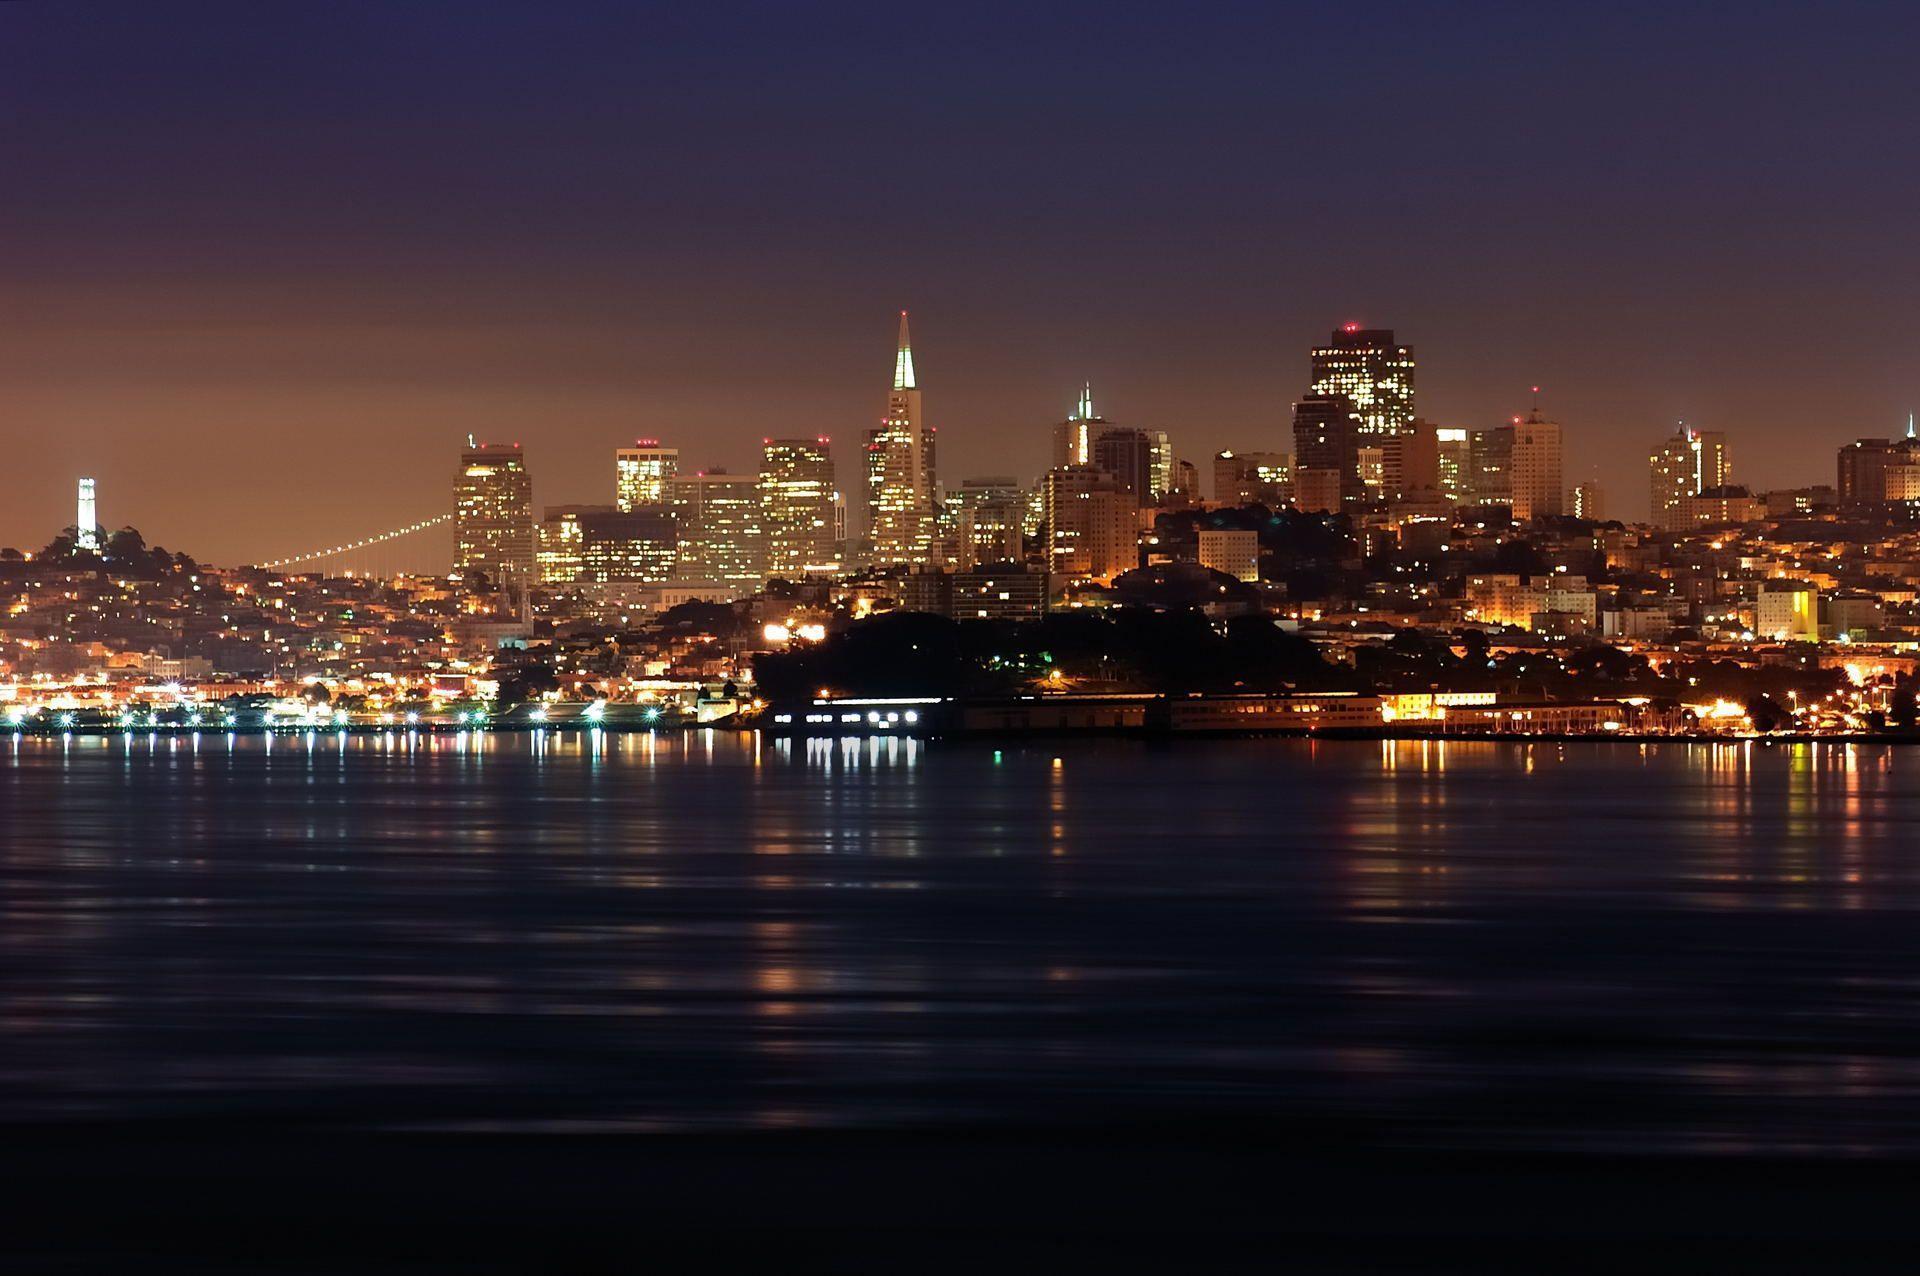 San Francisco Skyline Wallpapers - Wallpaper Cave